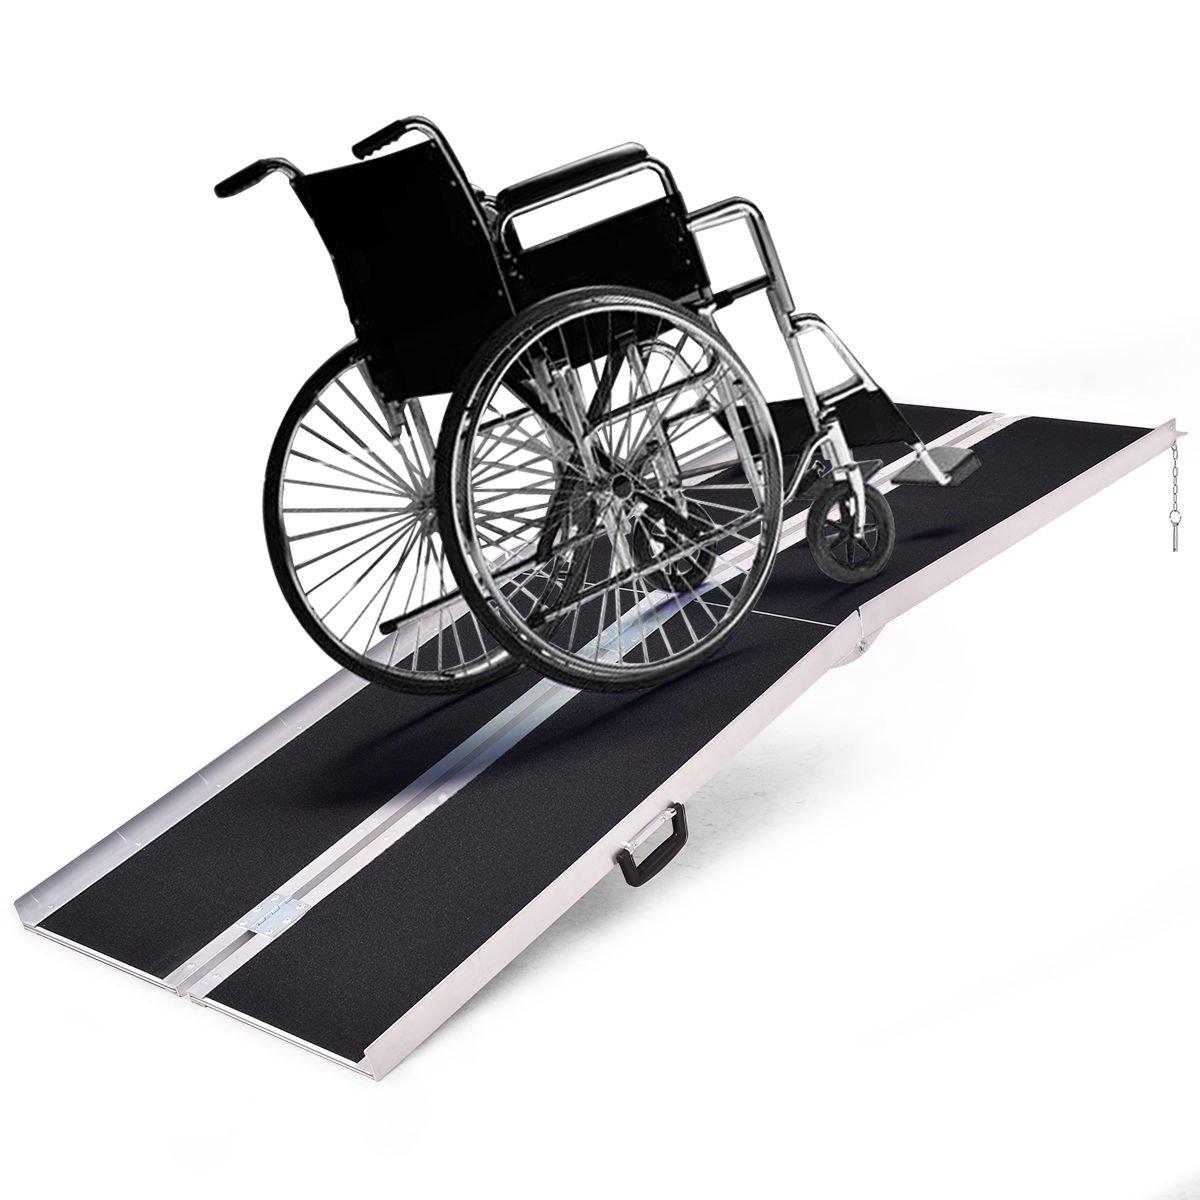 Amazon.com: Goplus® - Rampa portátil para silla de ruedas ...